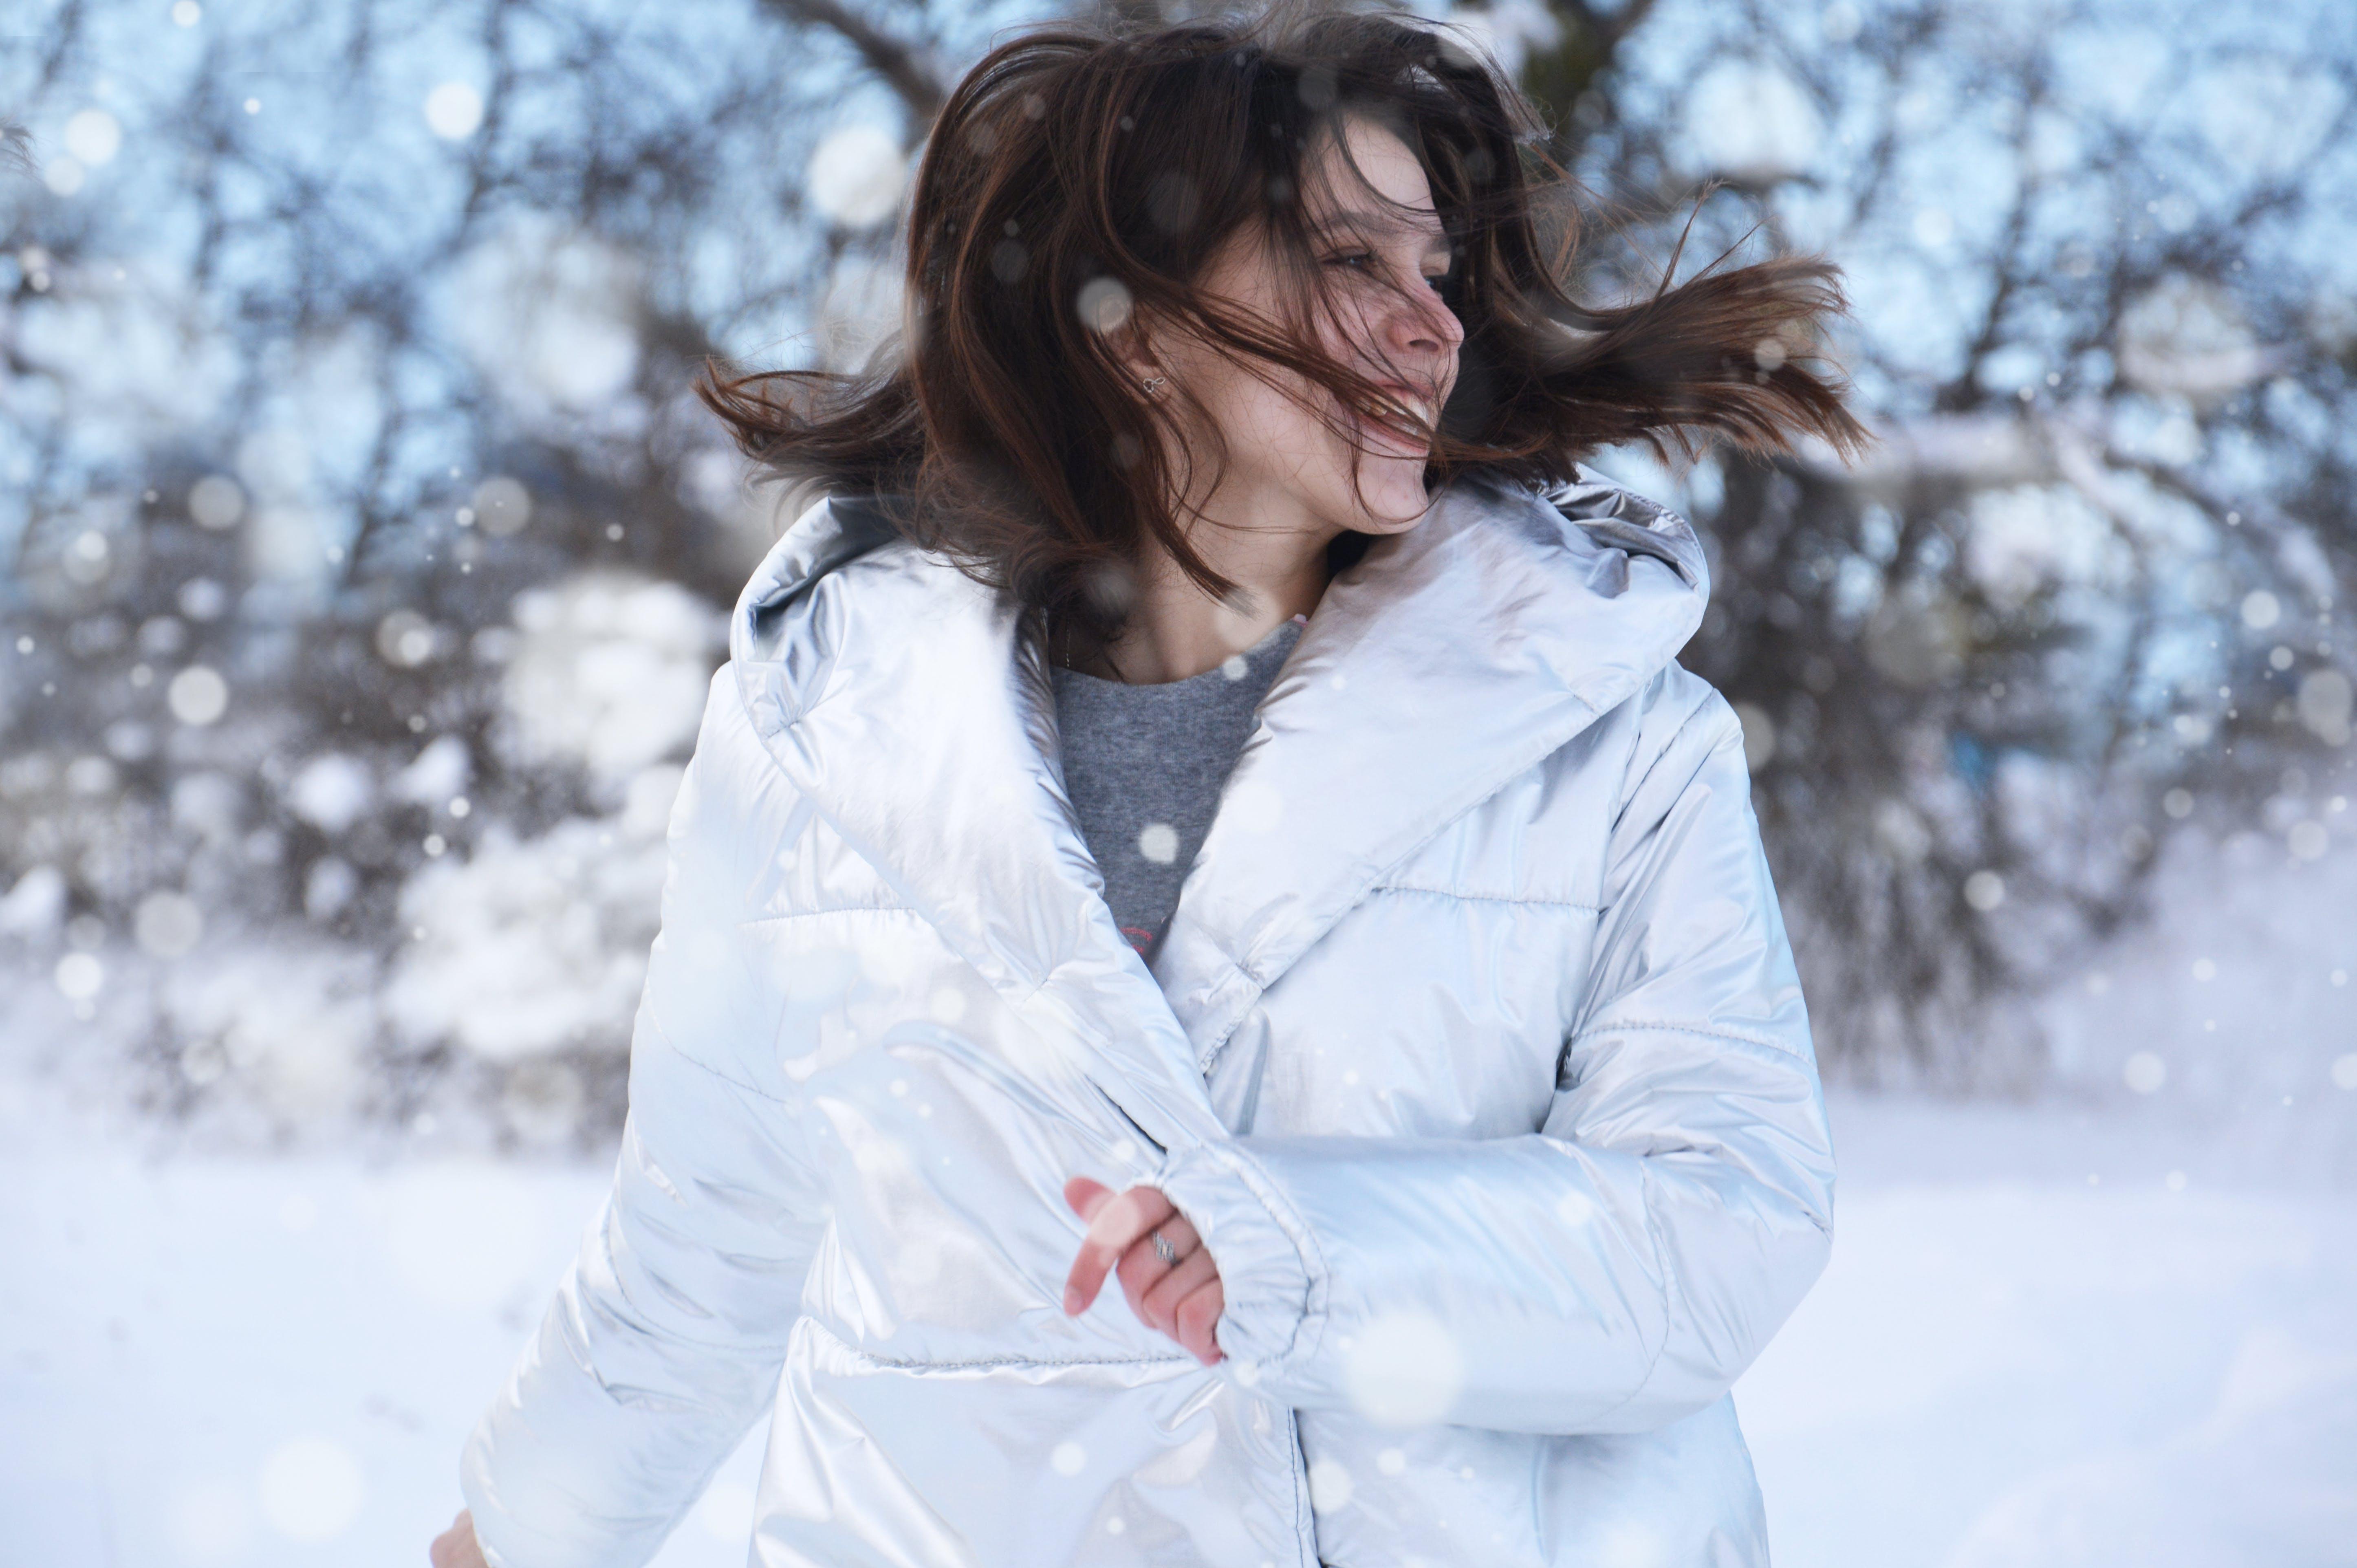 Women's White Winter Coat